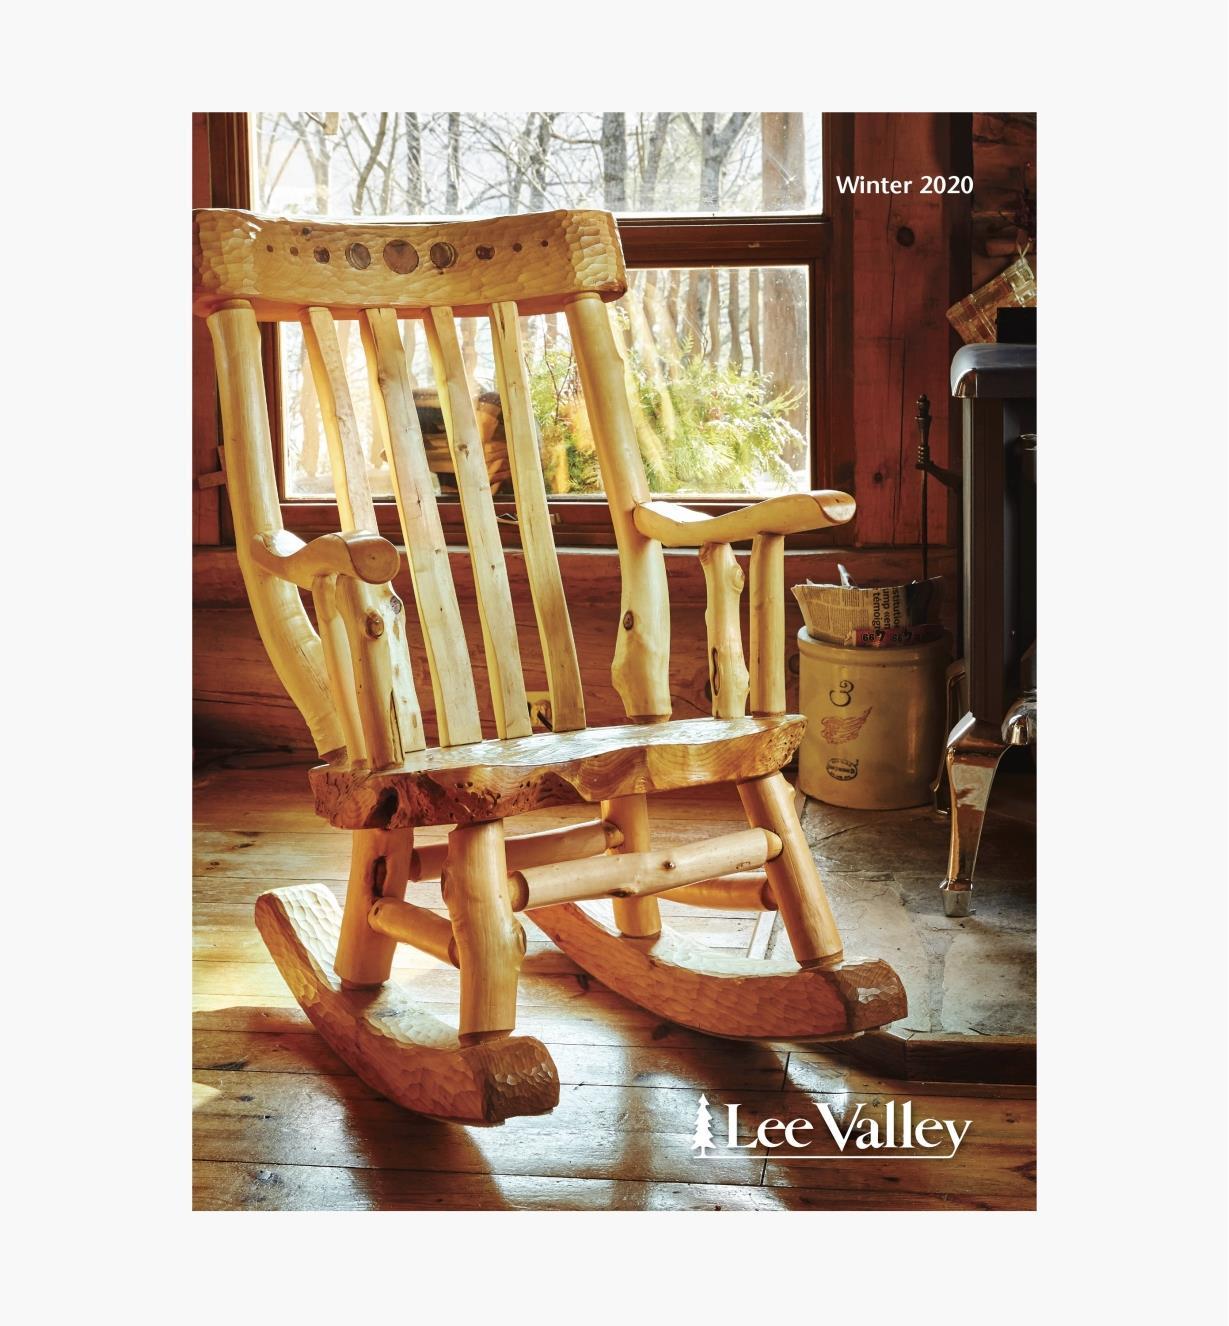 C0120W - Winter 2020 Woodworking